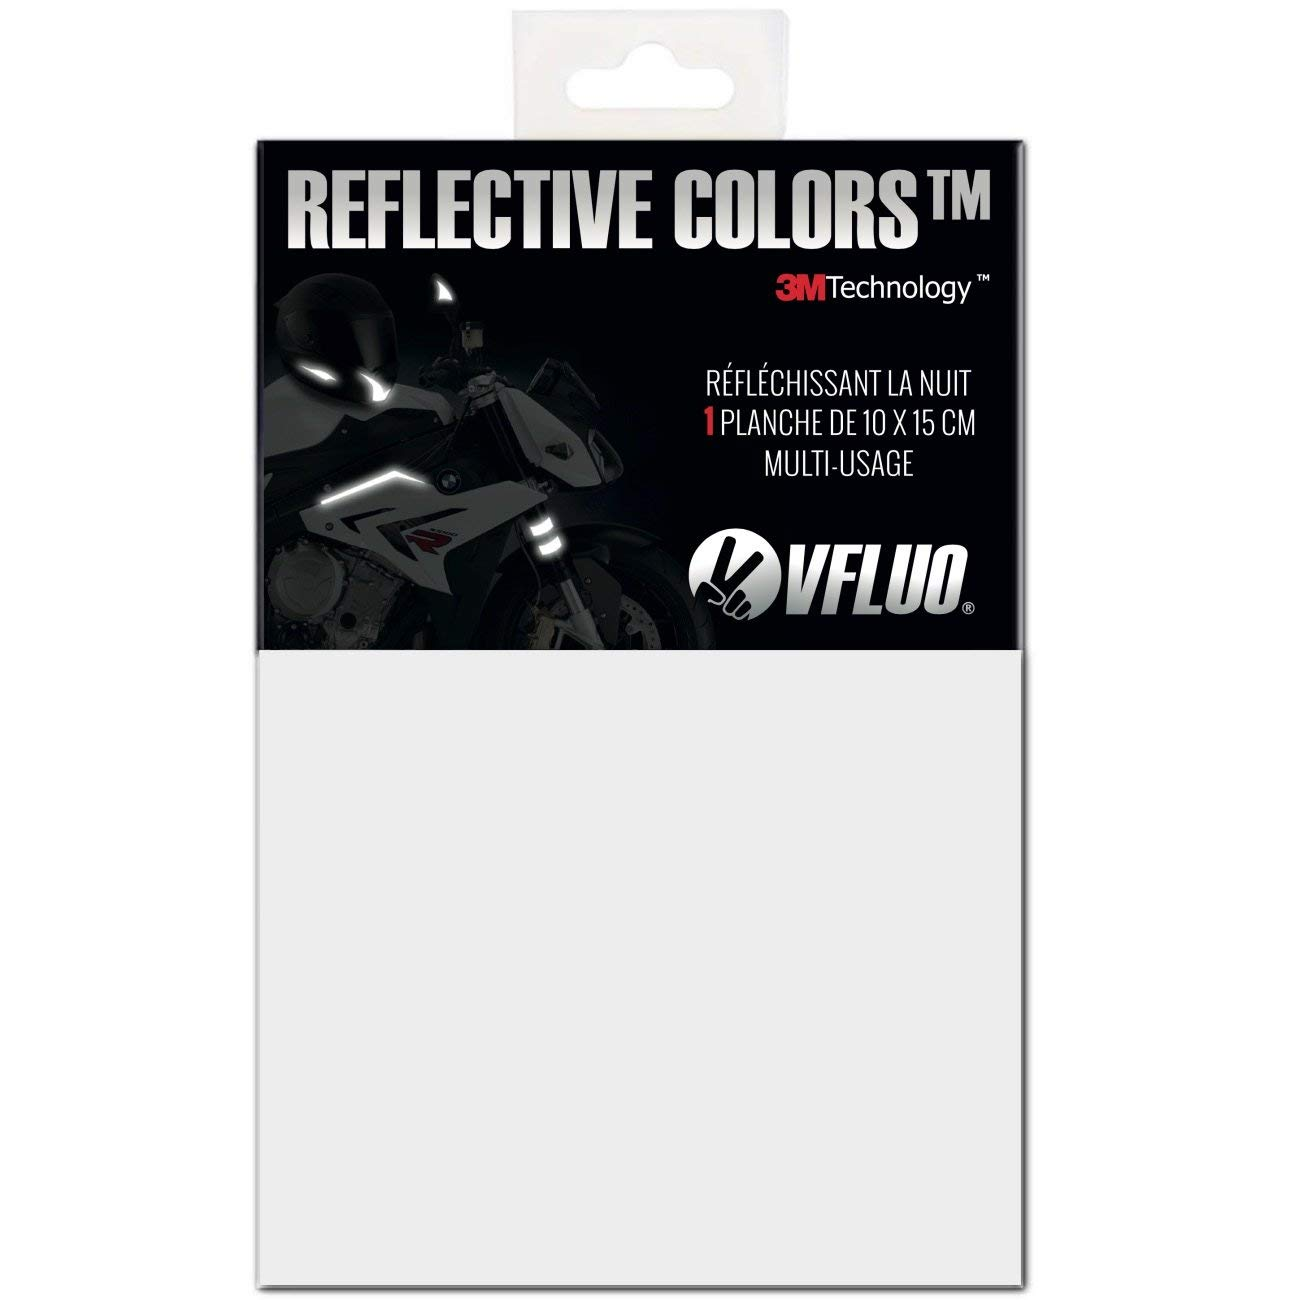 f3e9b21b Amazon.com: VFLUO 3M REFLECTIVE COLORS™, Universal adhesive DIY kit for  Helmet/Motorcycle / Scooter/Bike, 3M Technology™, 10 x 15 cm sheet, White/ Silver: ...